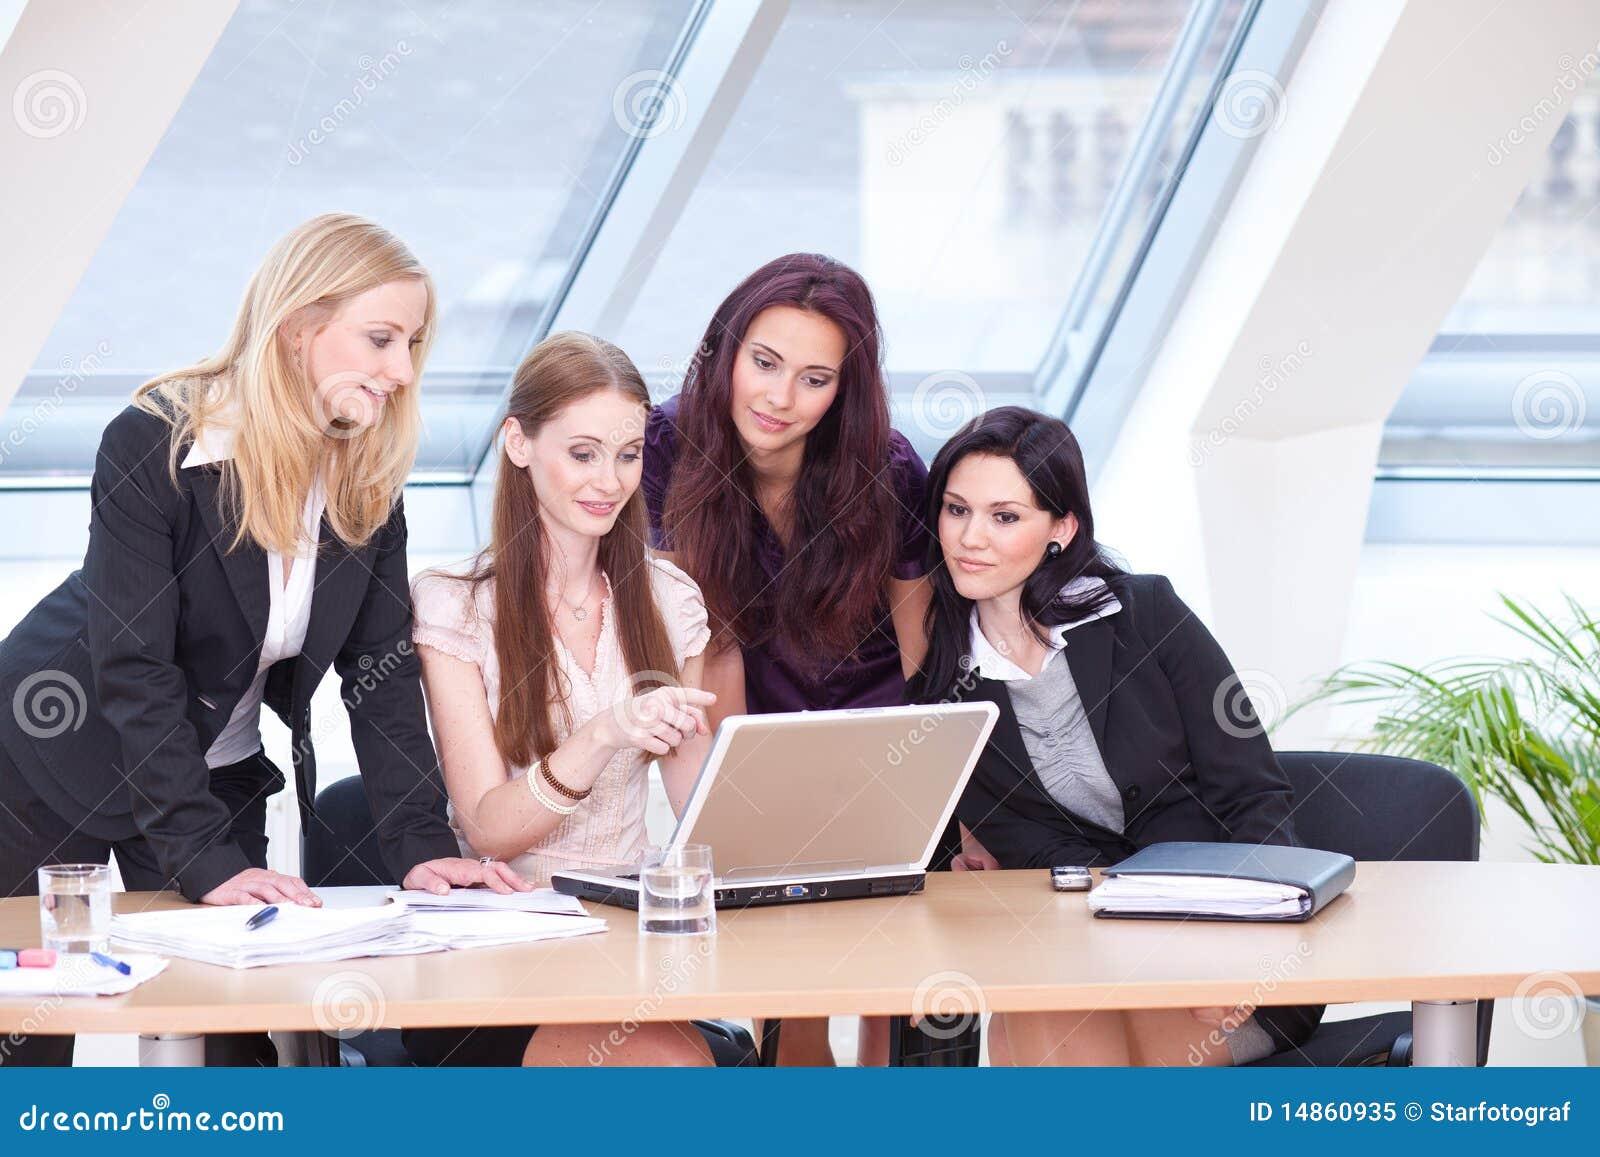 Learning associates